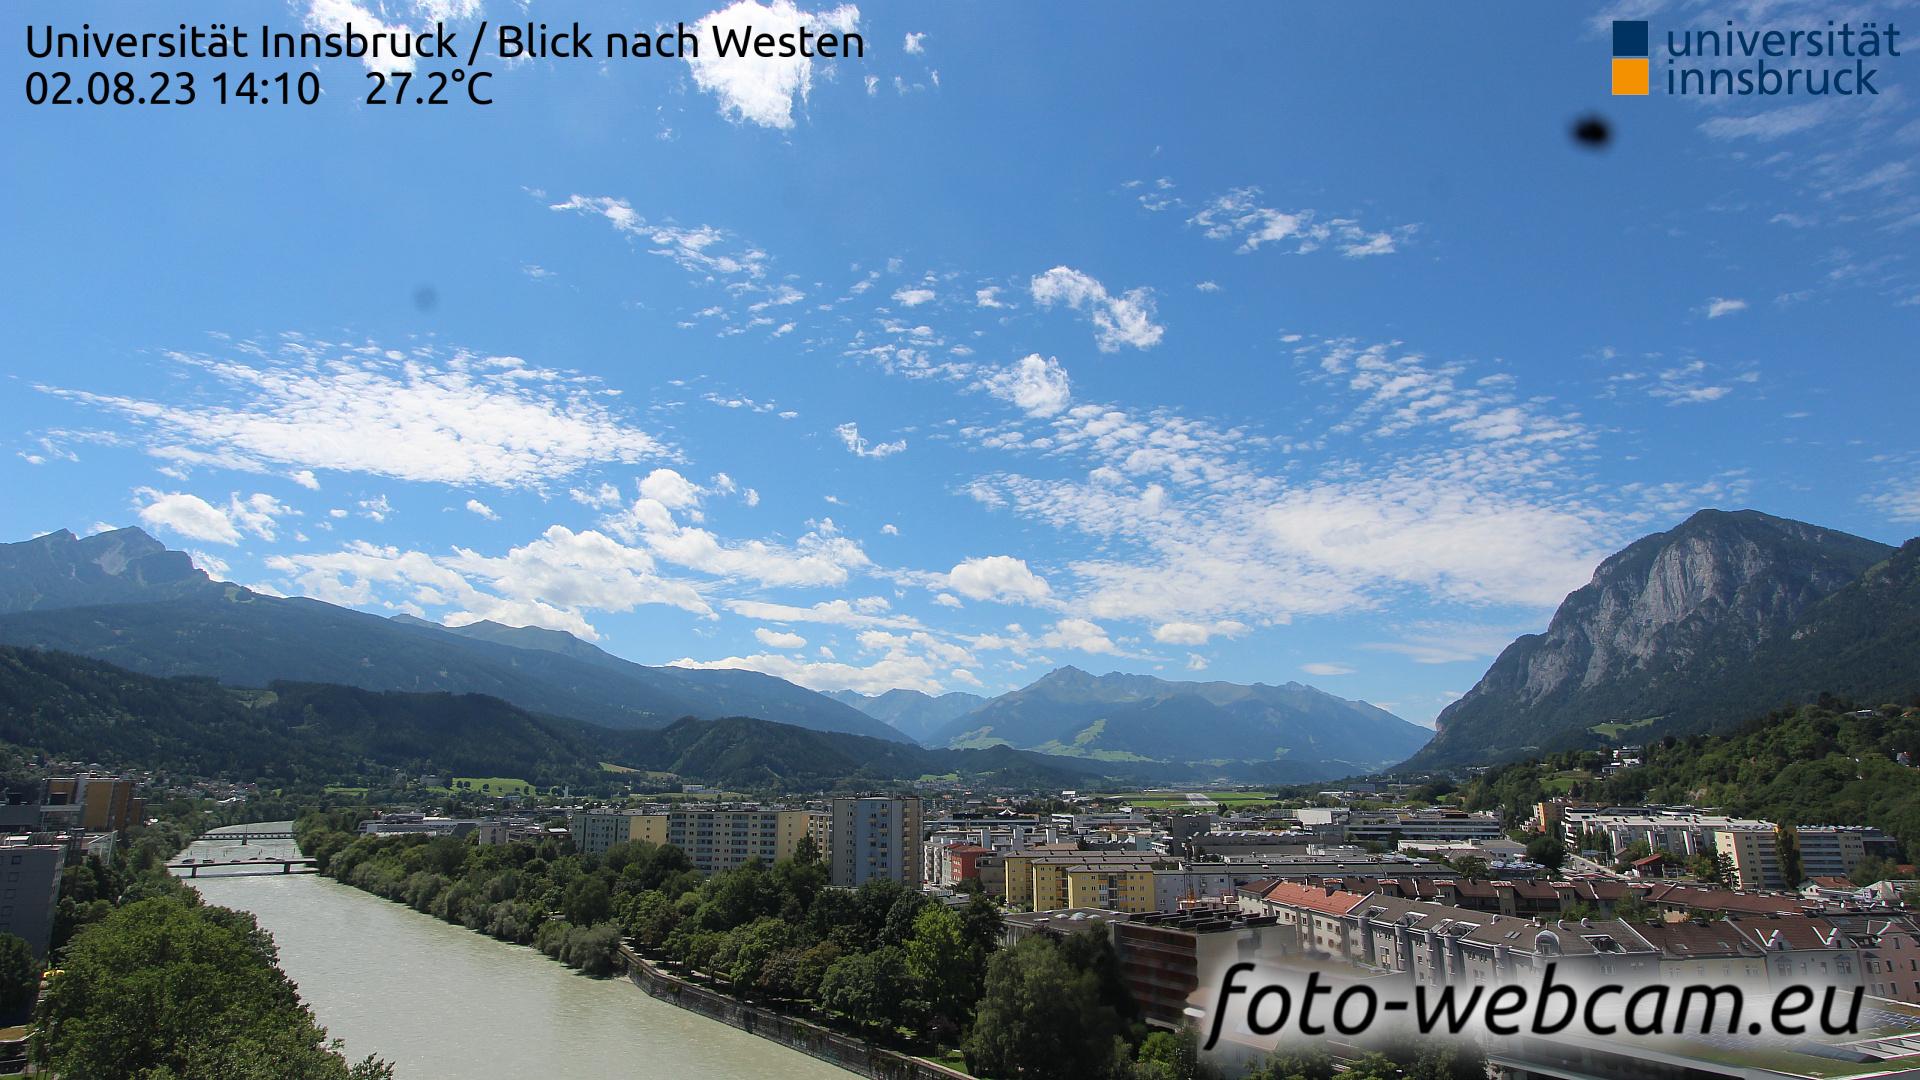 Innsbruck Sun. 14:25